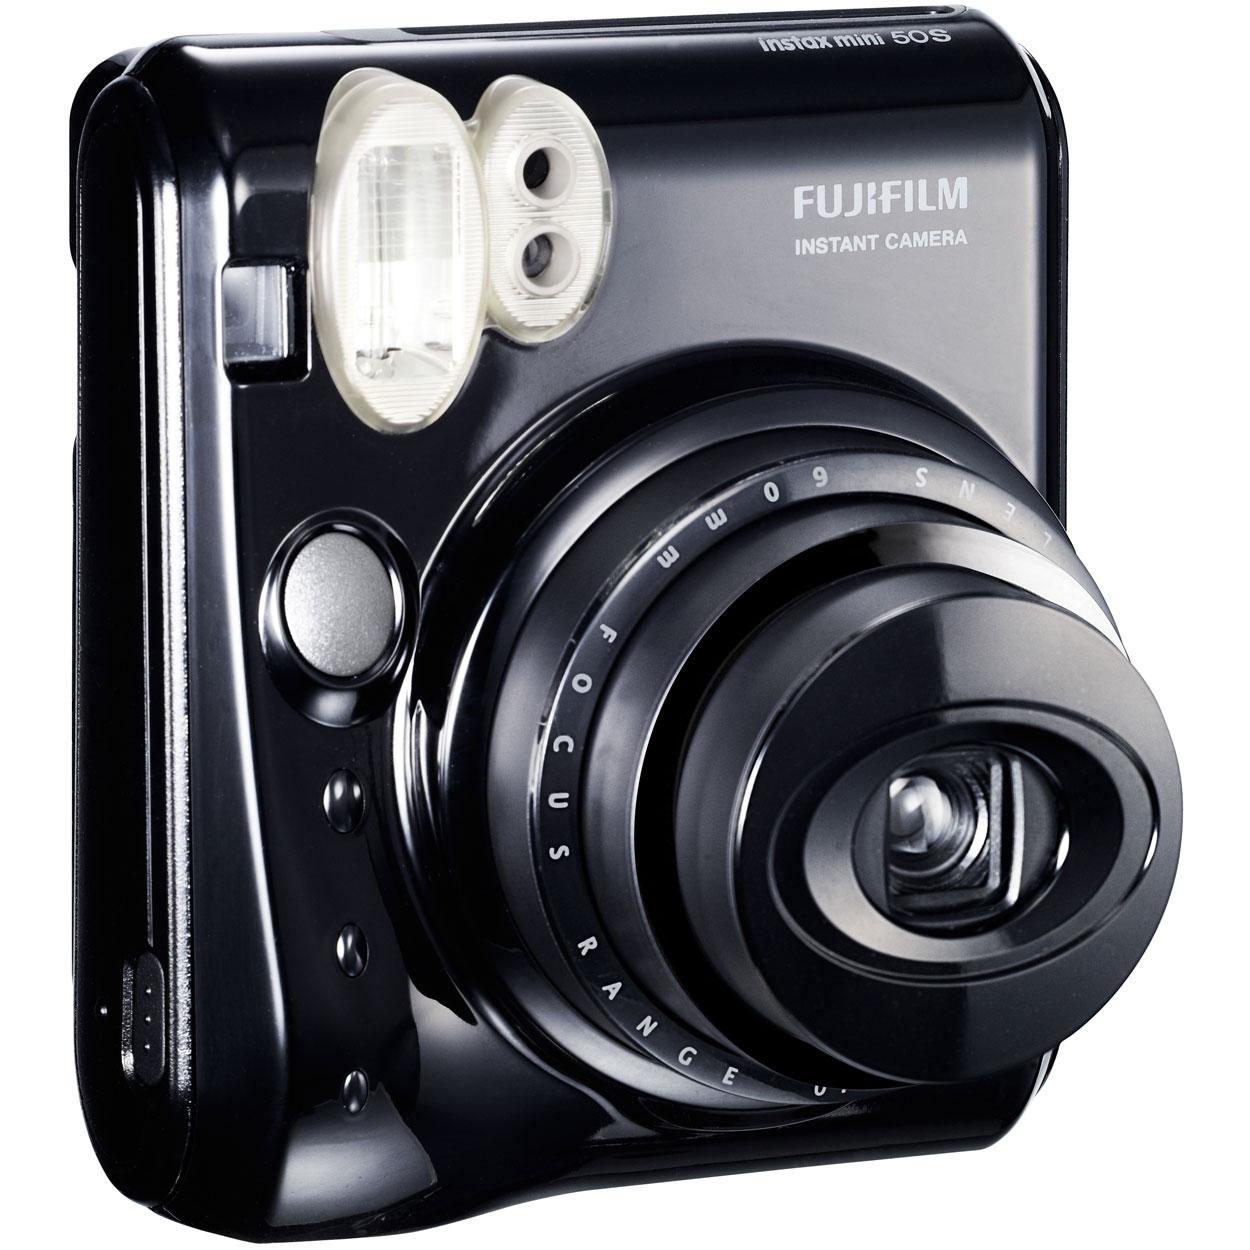 Fujifilm Camera Instax Mini 50S Black